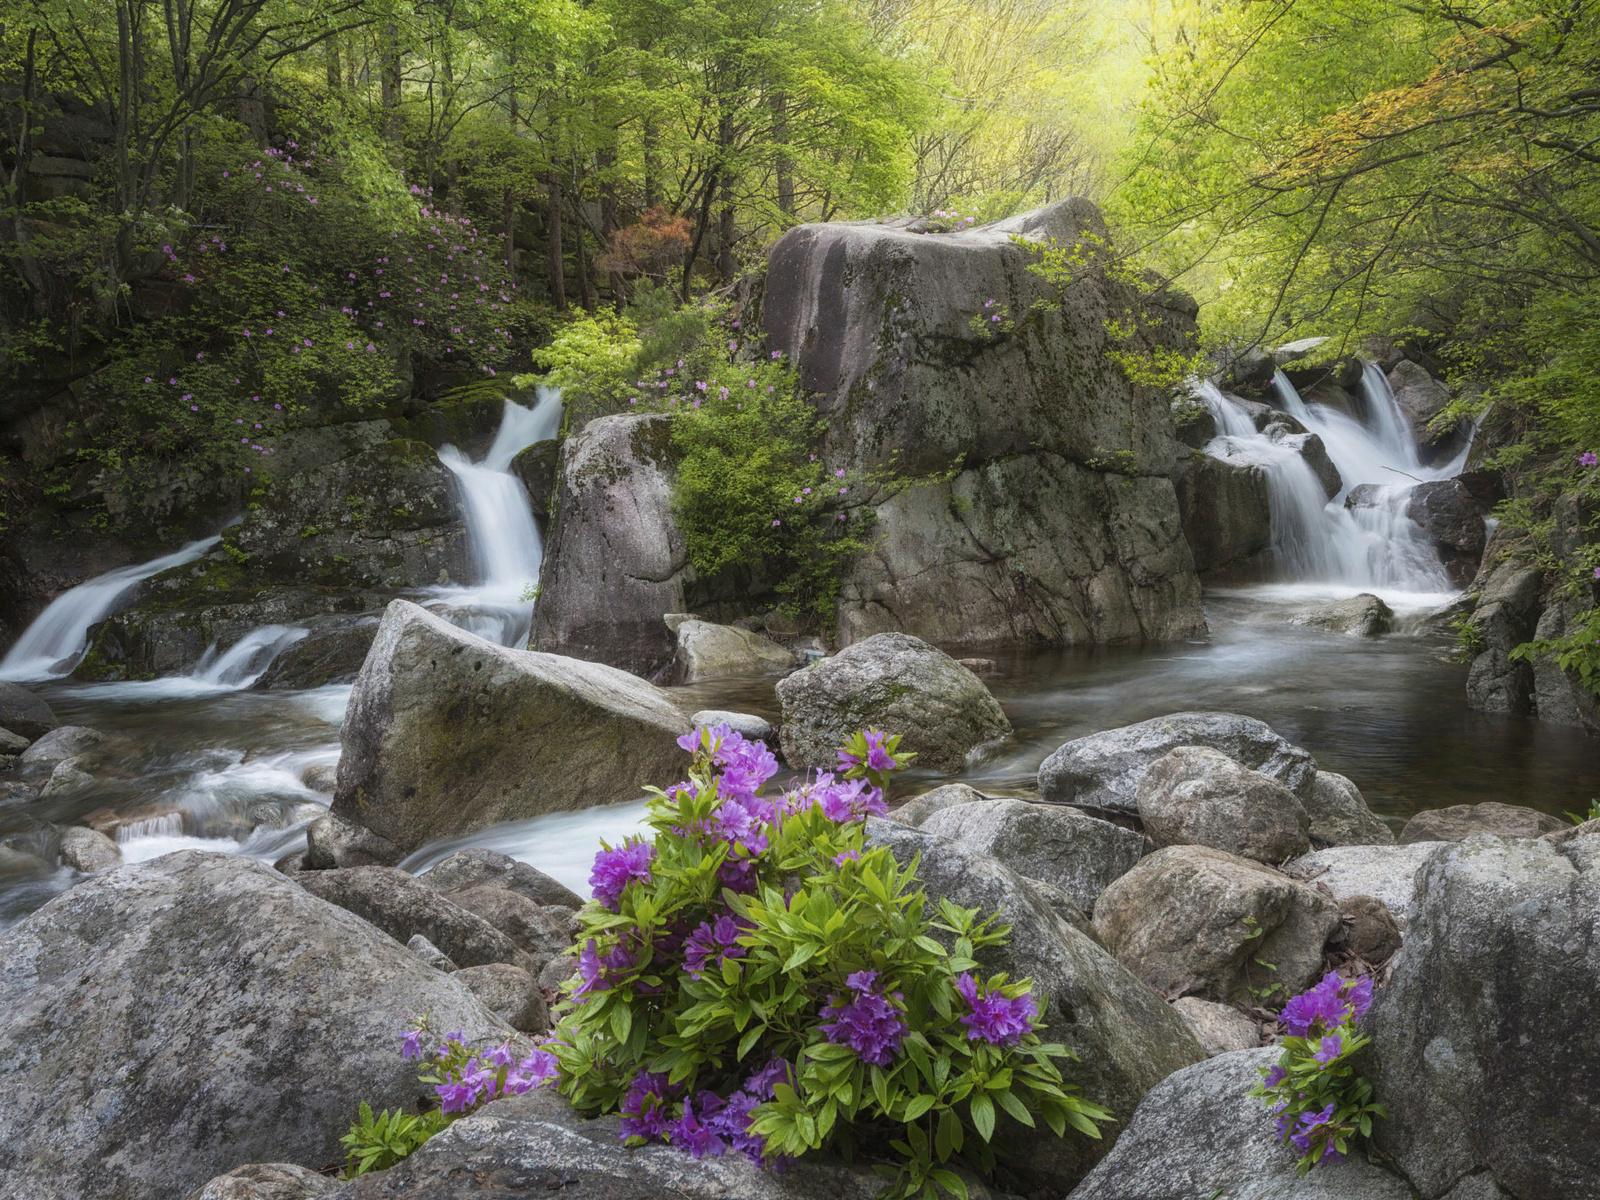 лес, пейзаж, цветы, природа, ручей, камни, водопад, корея, заповедник, рододендрон, азалия, jae youn ryu